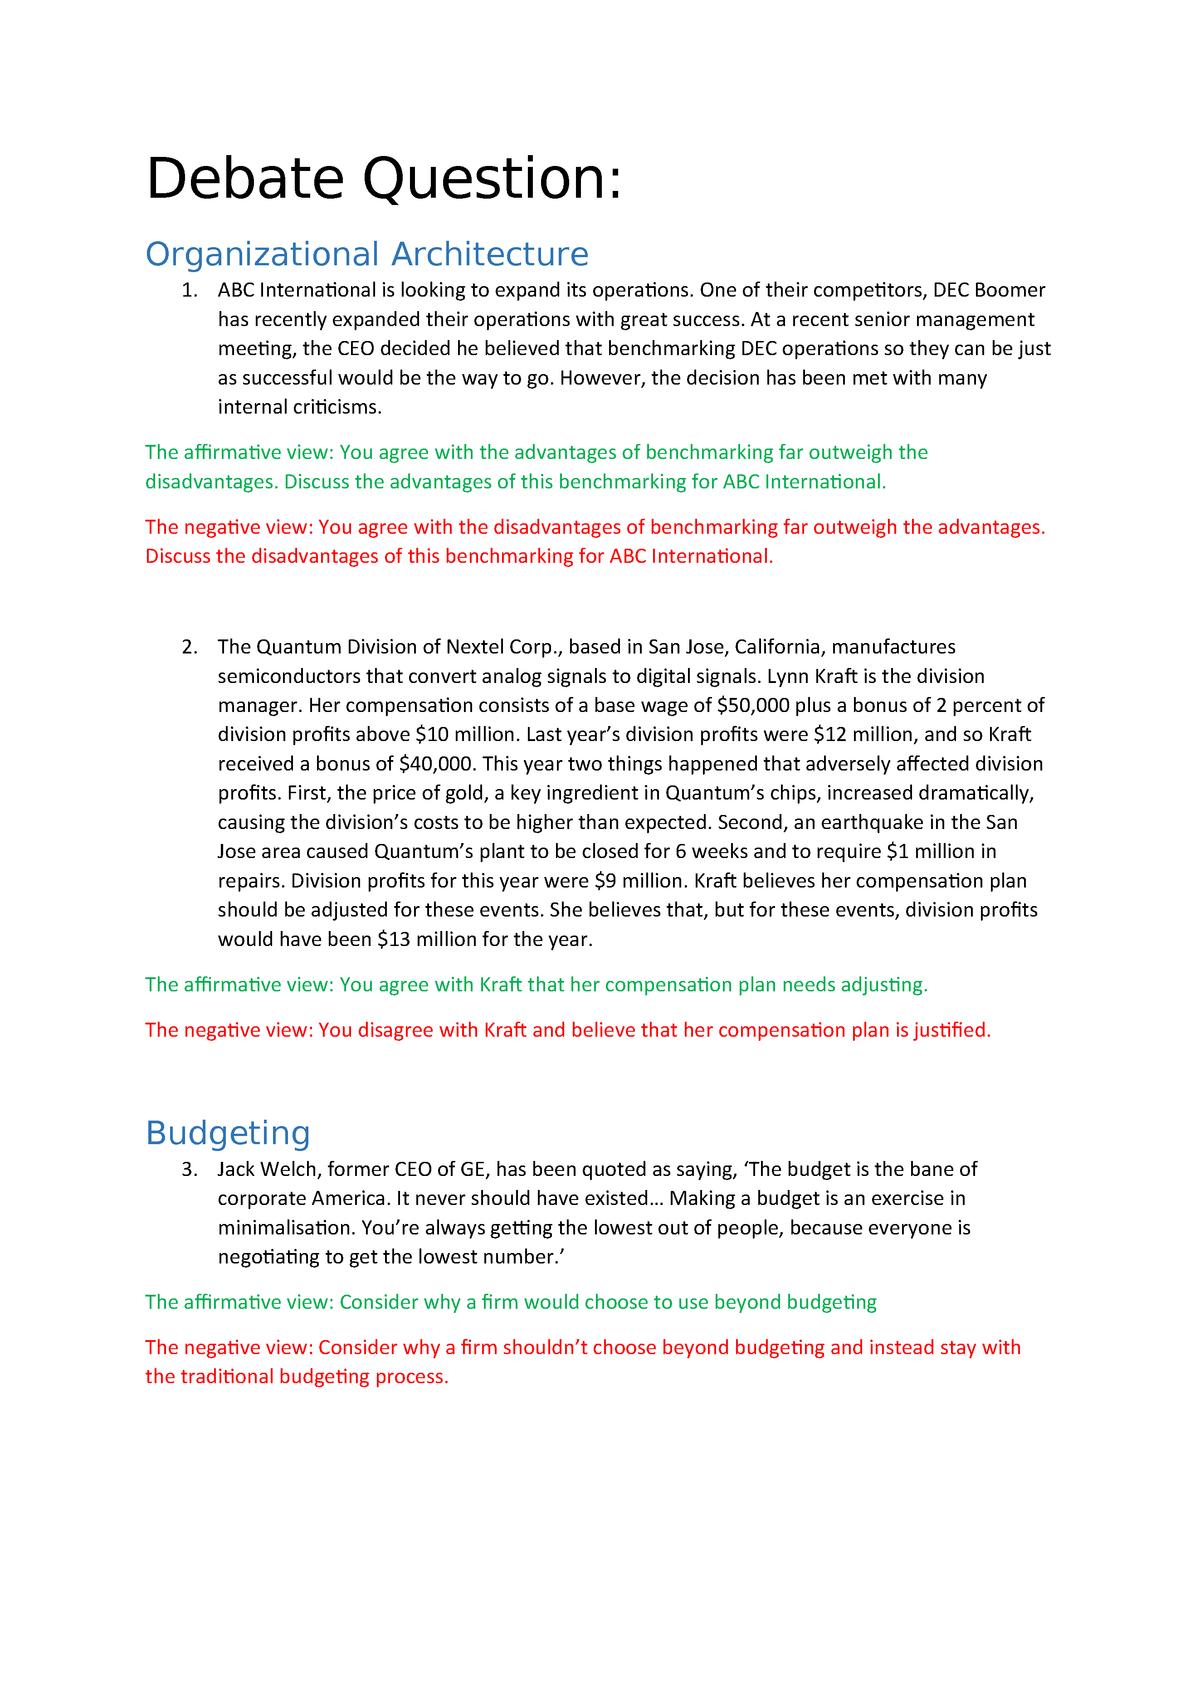 Case study questions - AYB321: Strategic Management Accounting - StuDocu